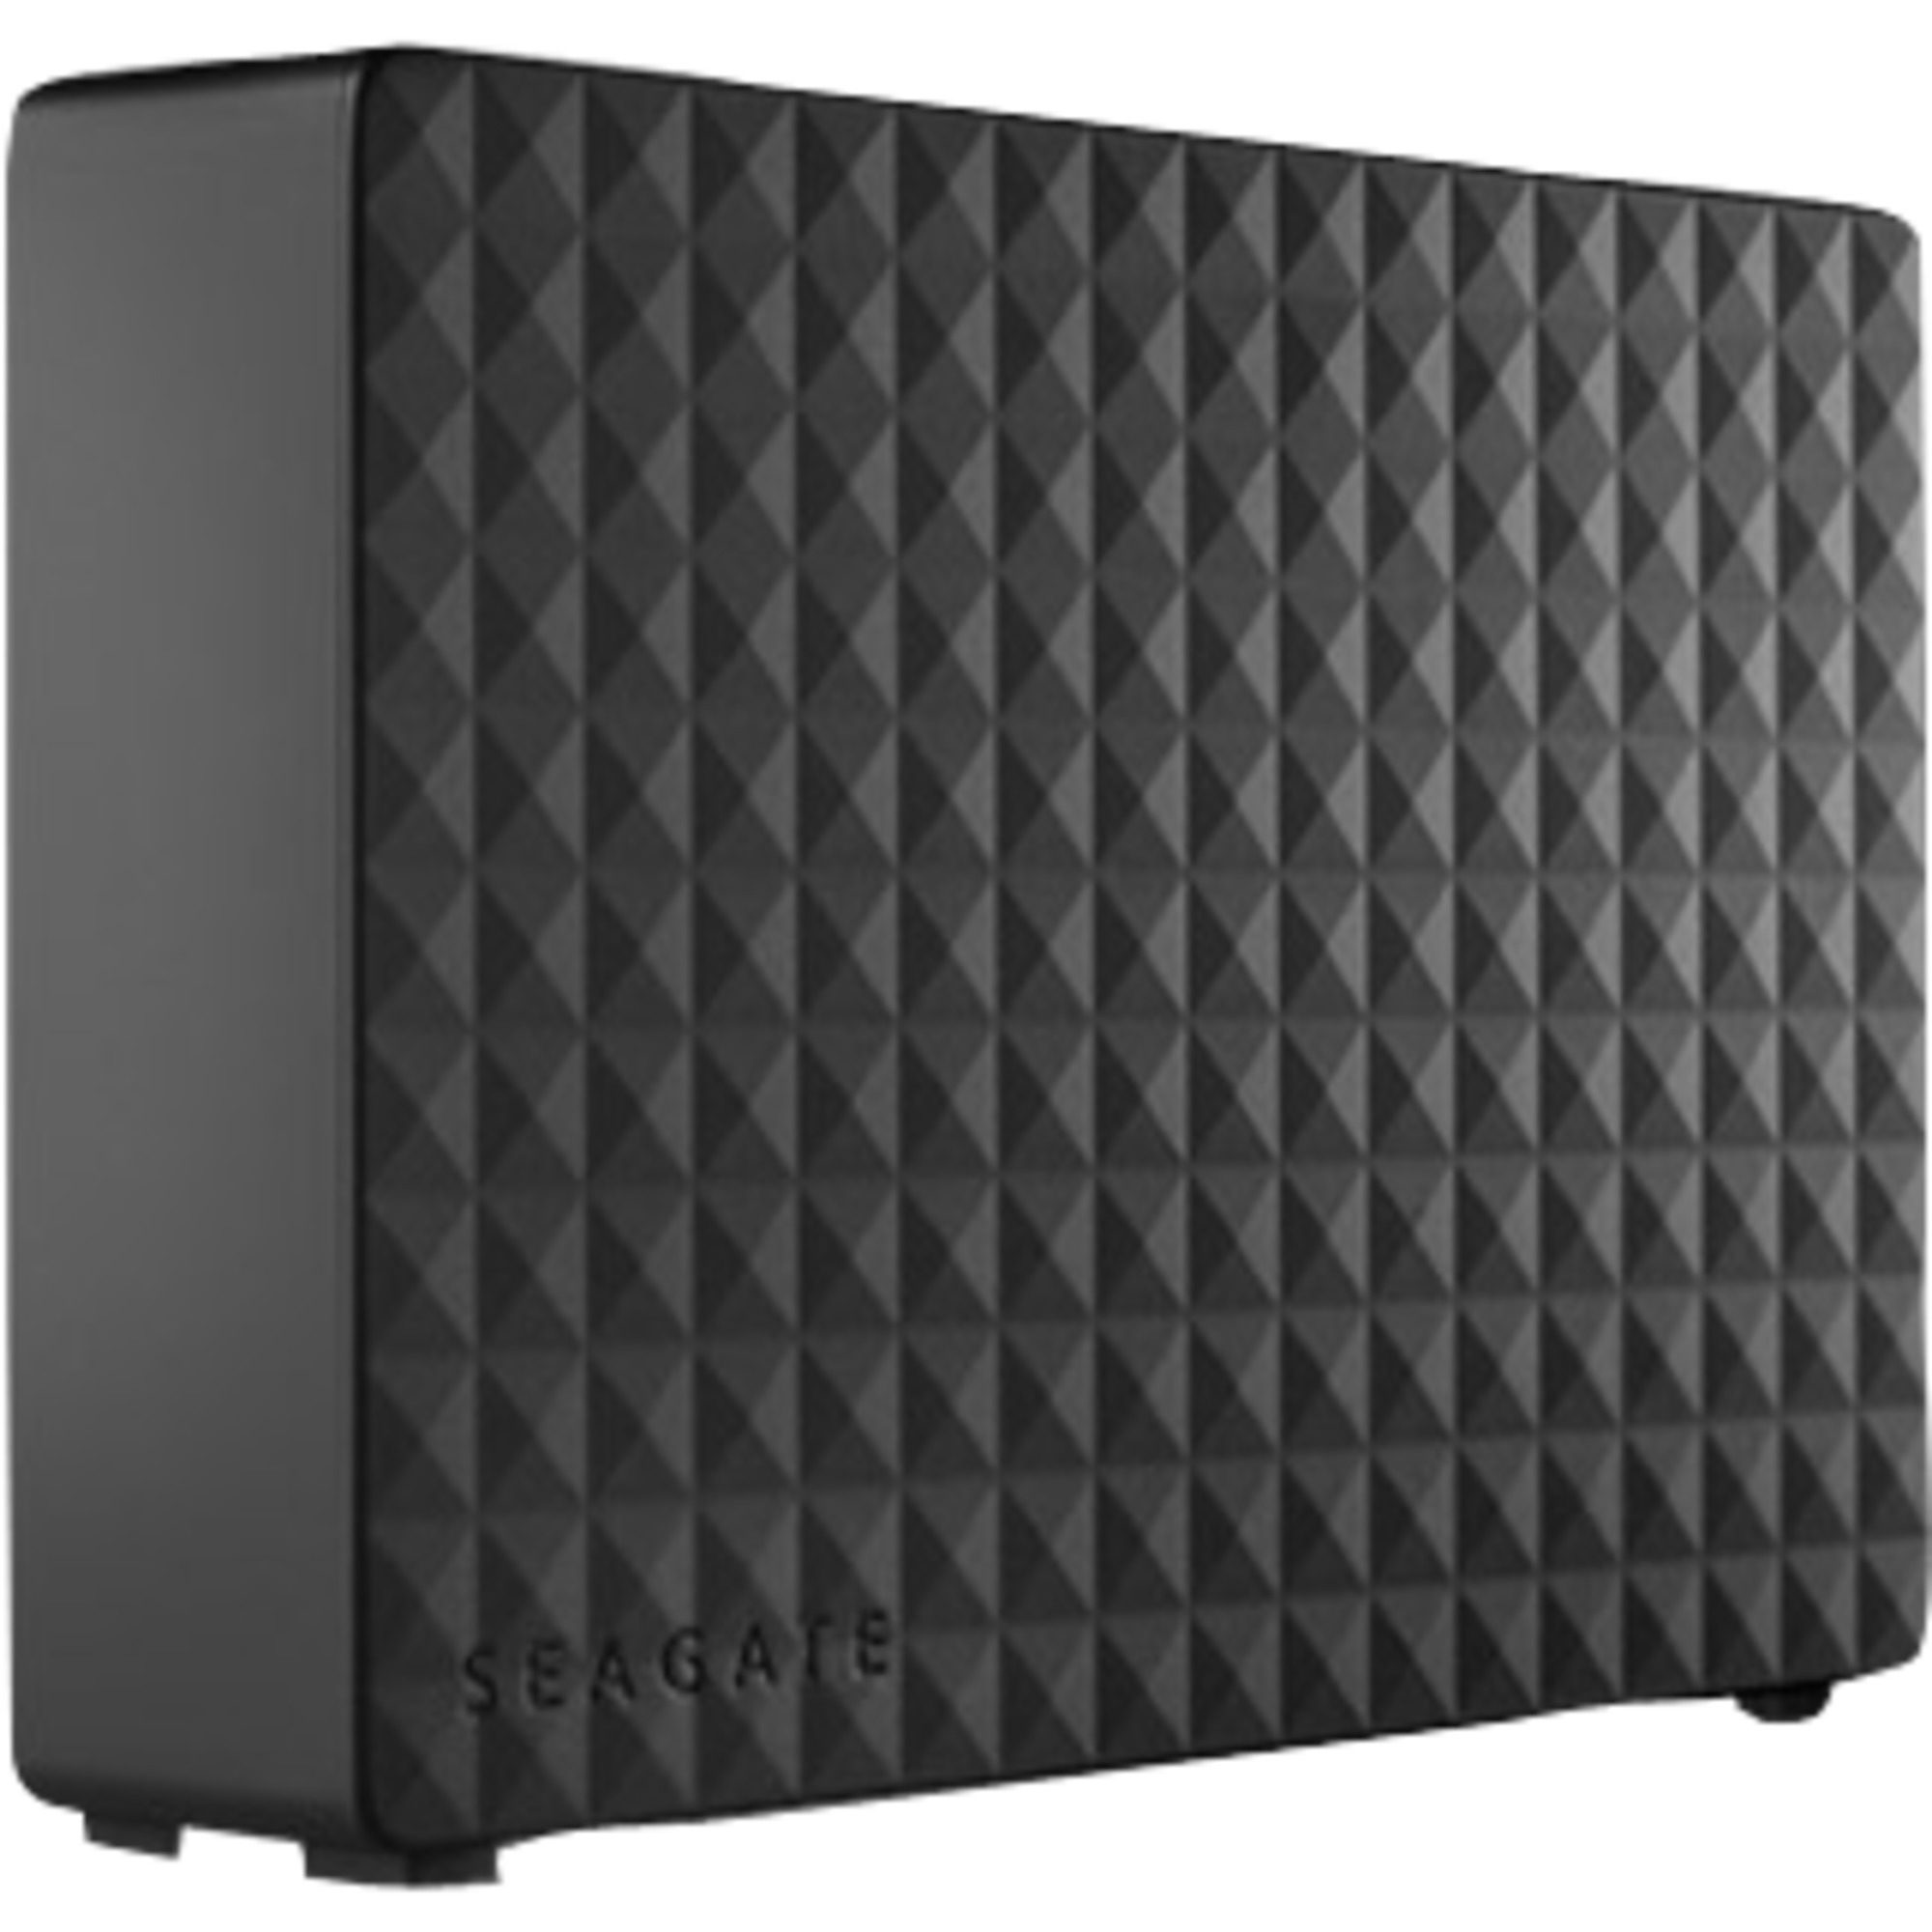 Seagate Festplatte »Expansion Desktop 2 TB«